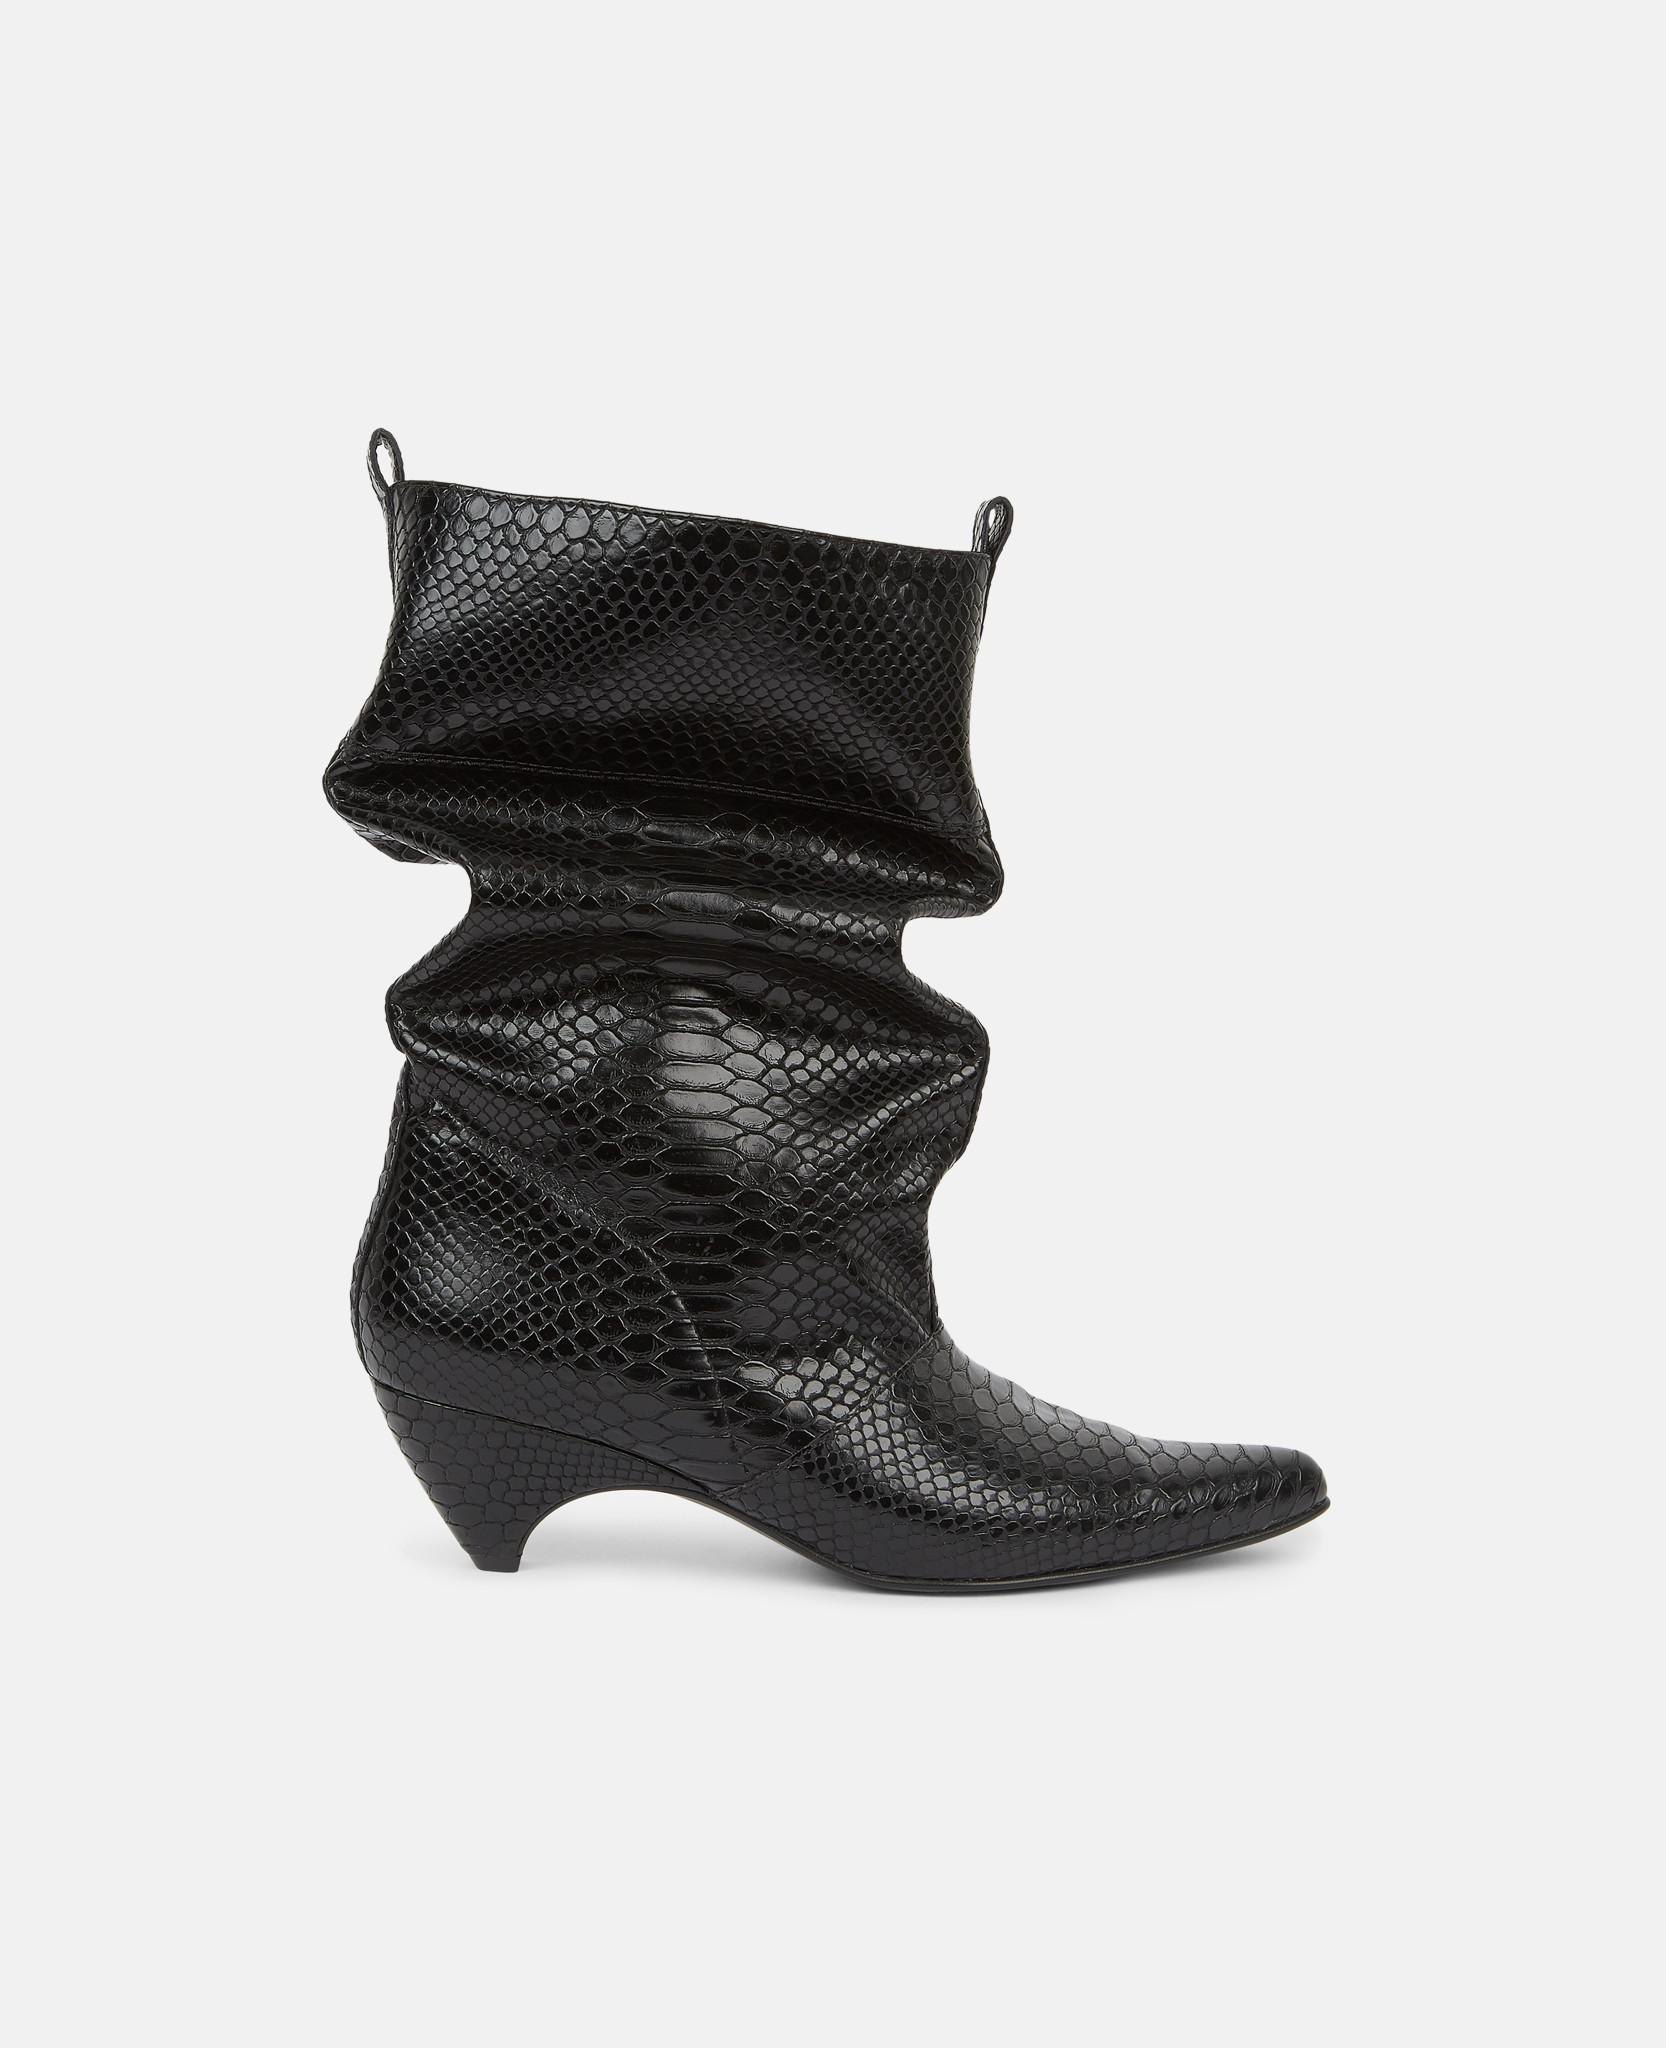 20324a7f2a0 Lyst - Stella McCartney Black Slouchy Boots in Black - Save 40.0%